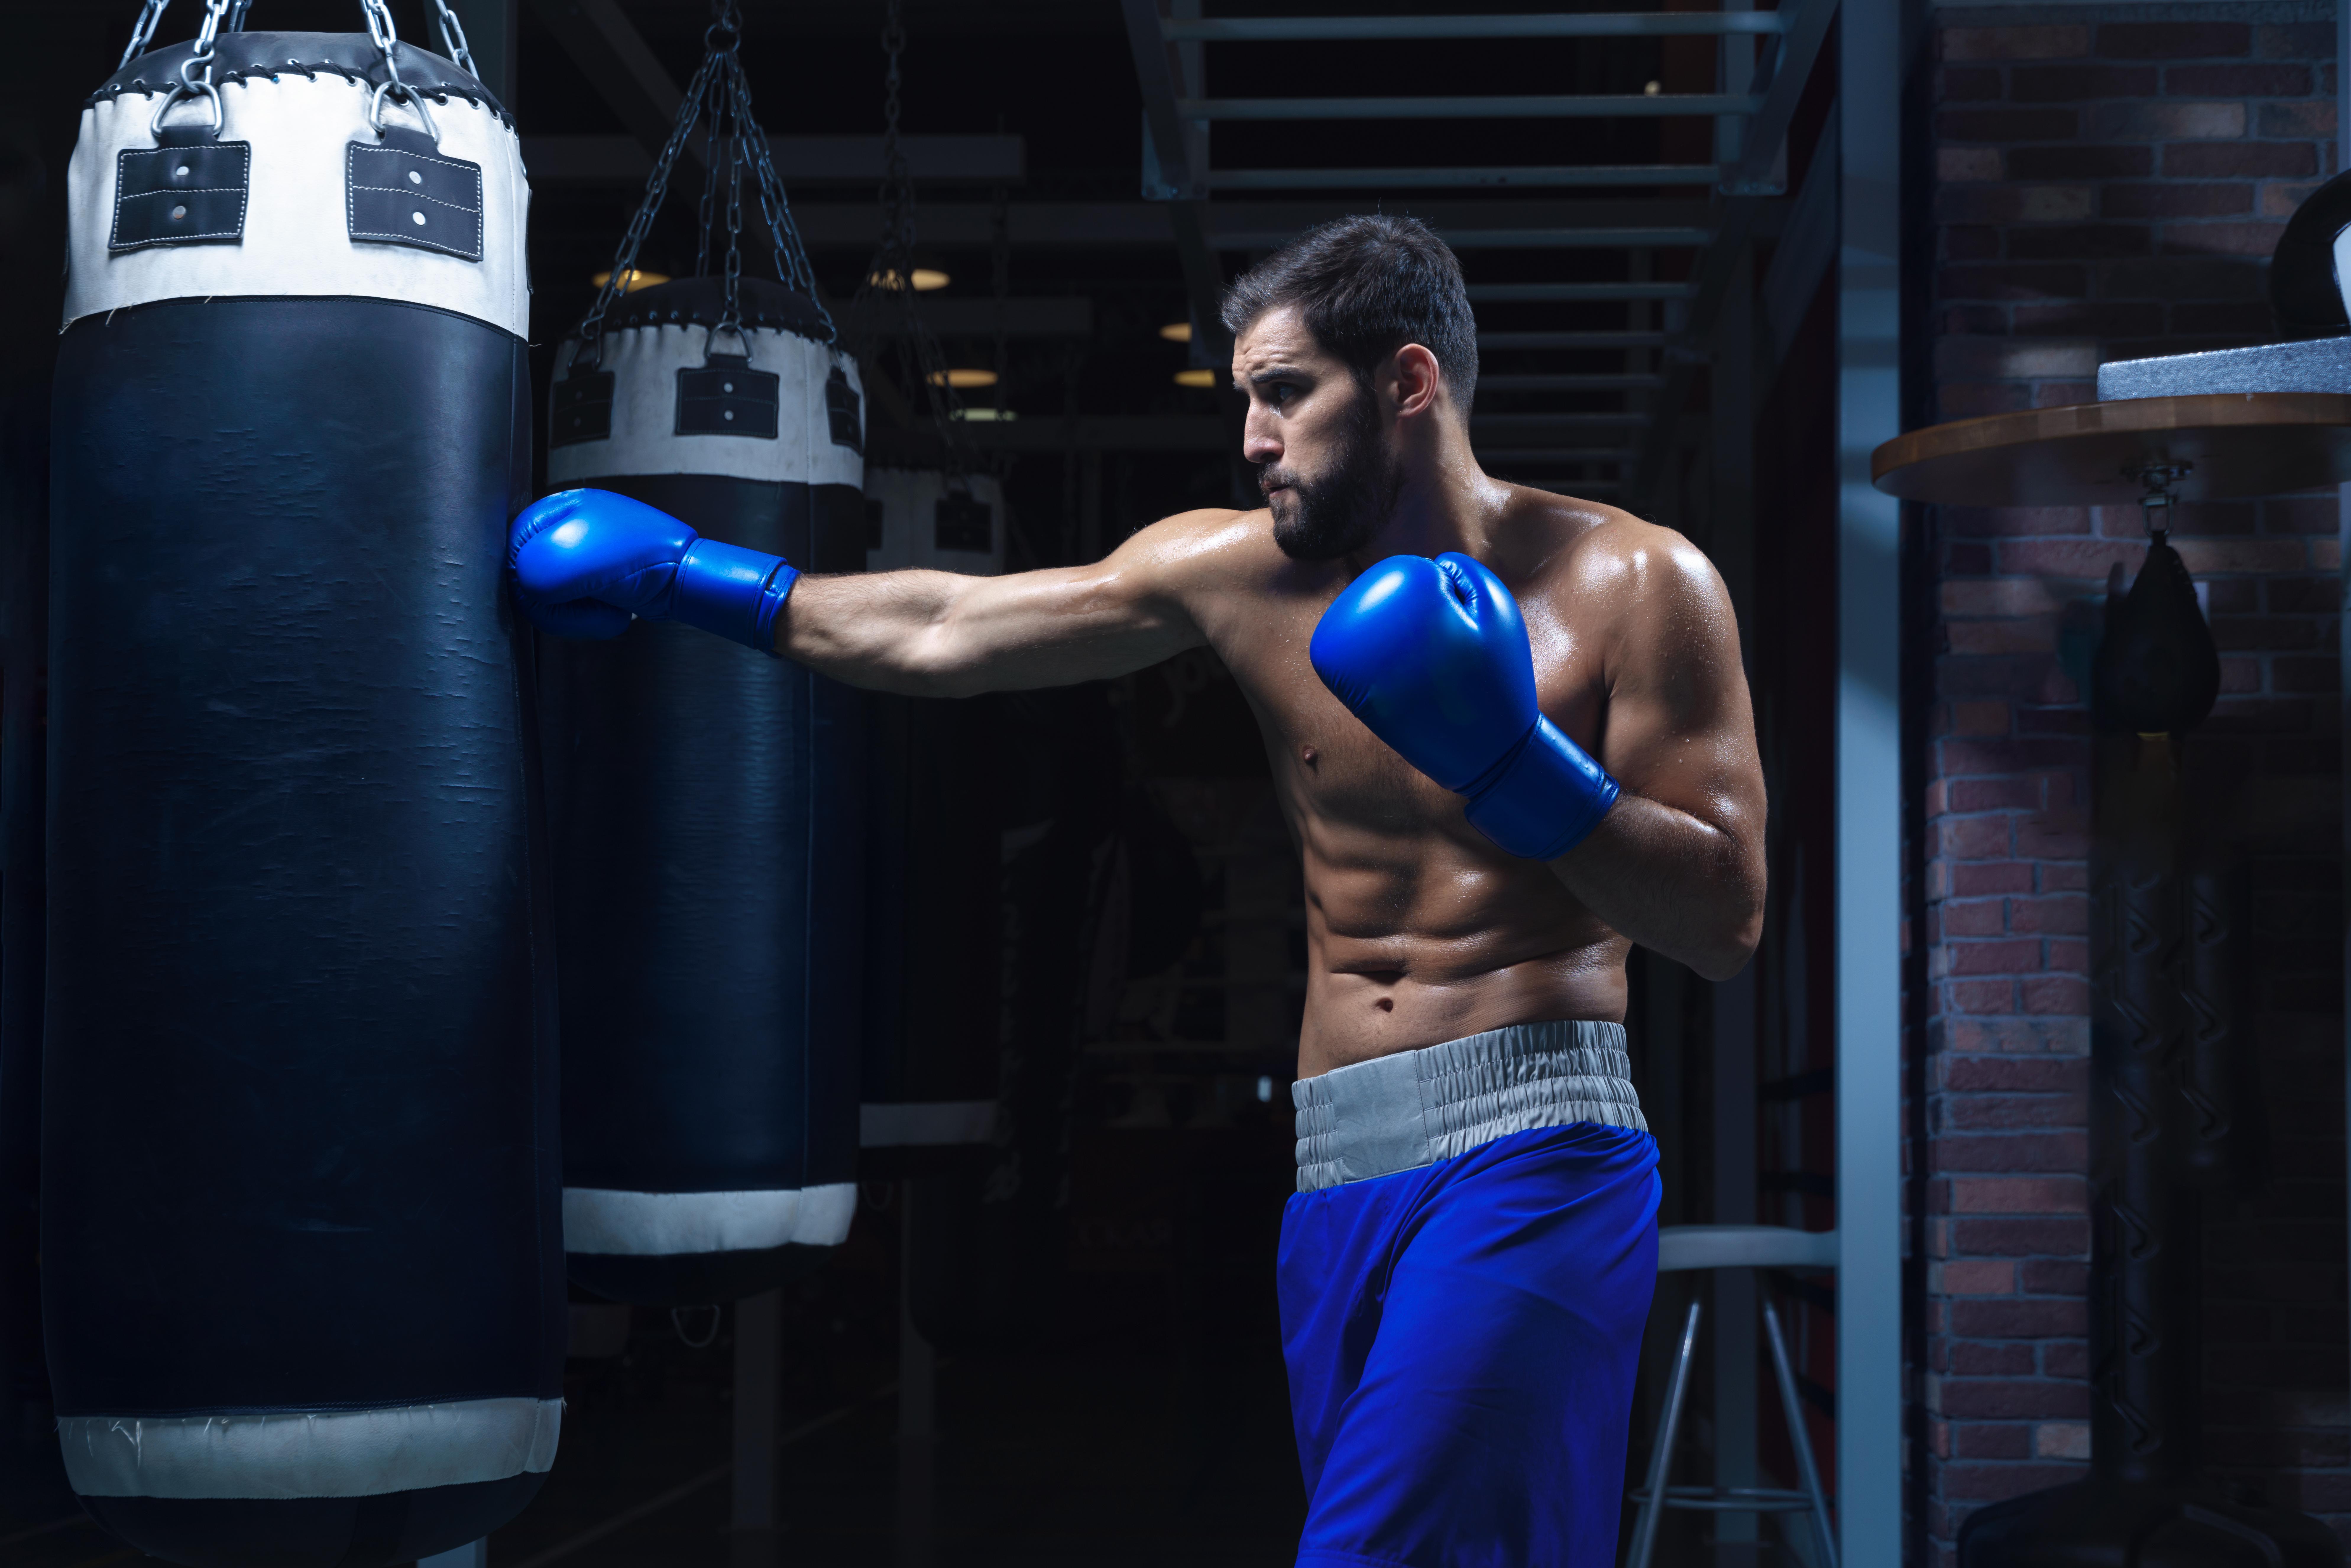 My Top 10 Fitness Resources (and one secret bonus)